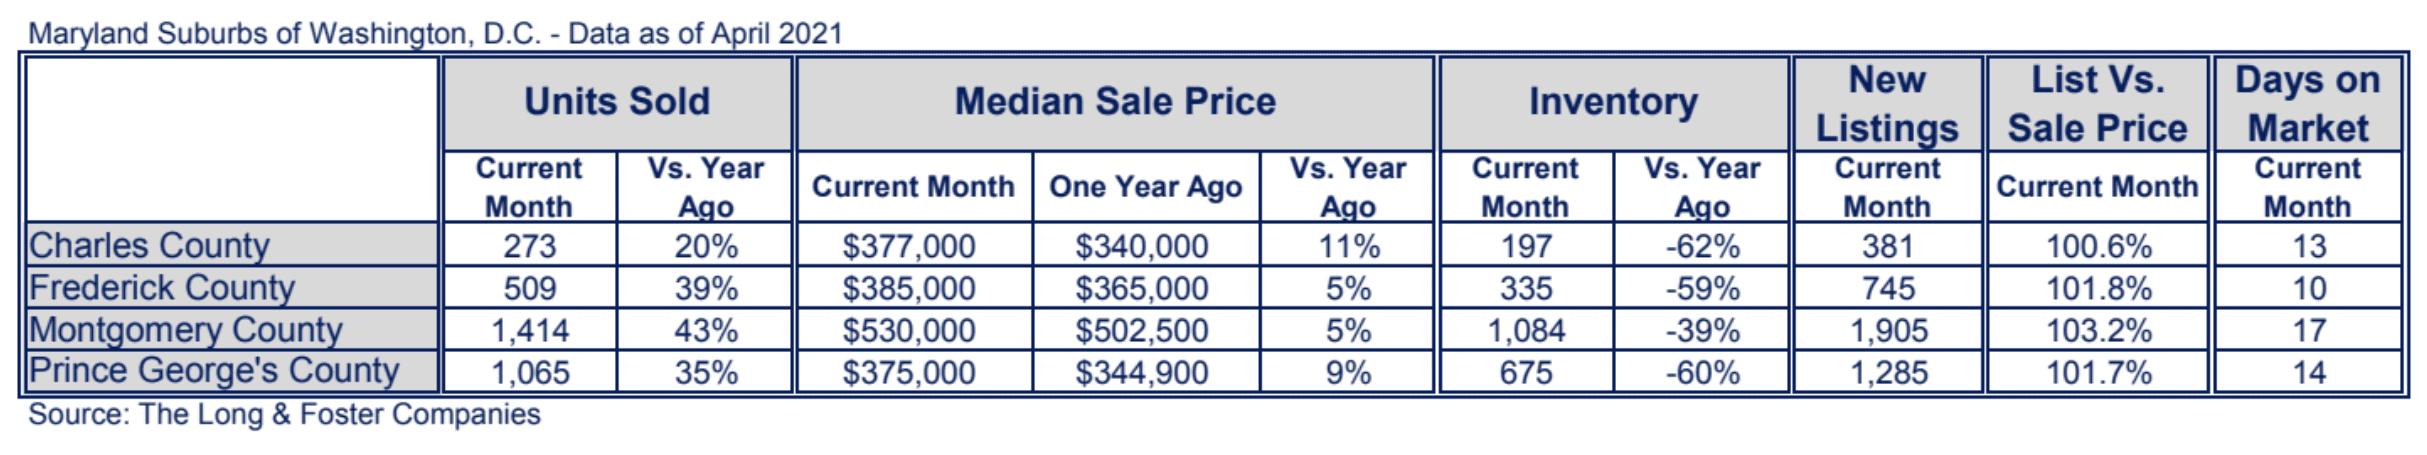 Maryland Suburbs Market Minute Chart April 2021